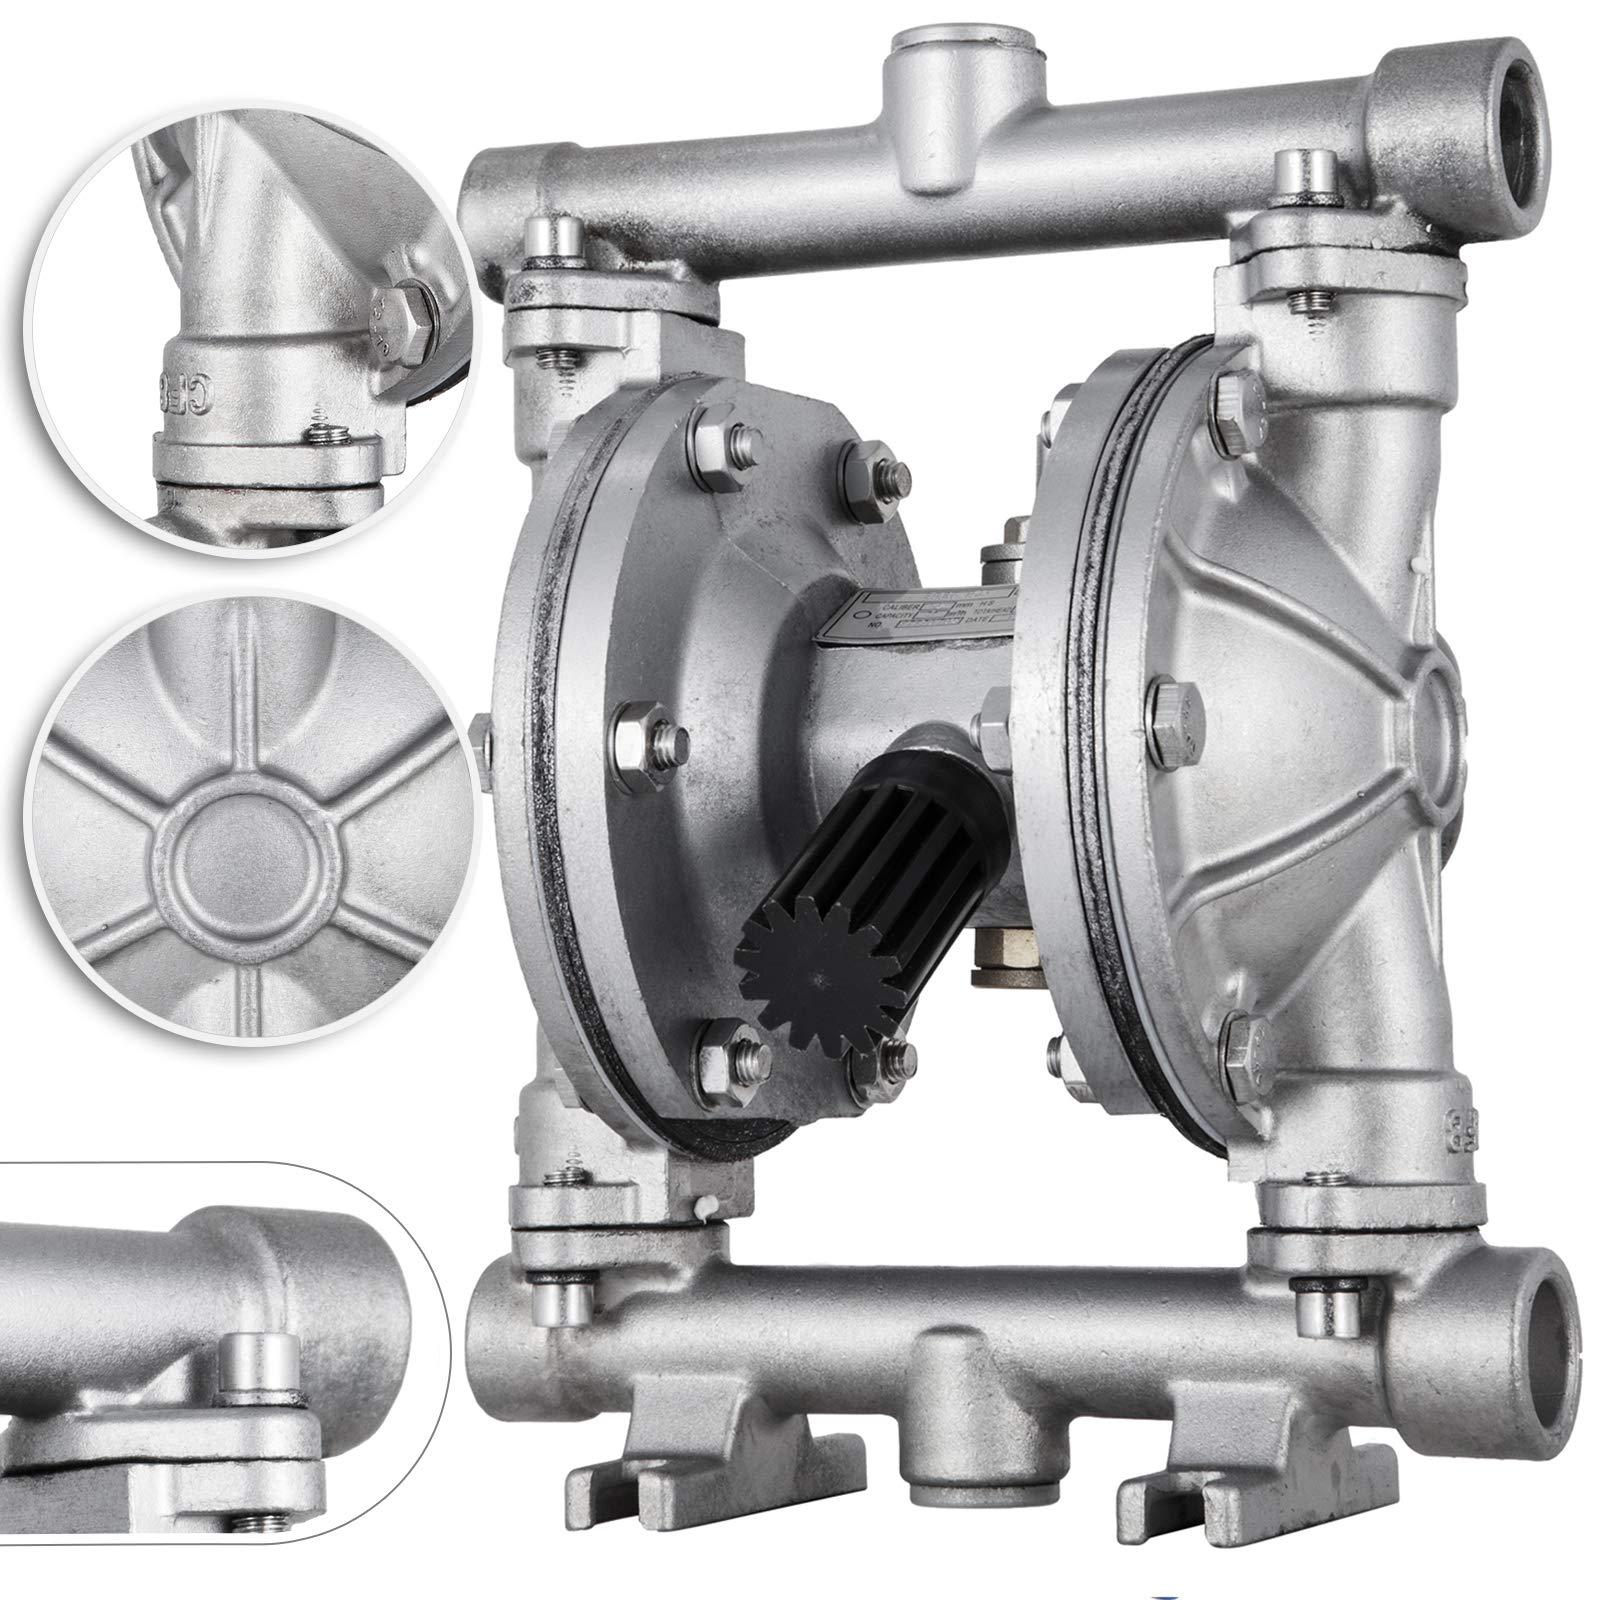 Happybuy Double Diaphragm Air Pump (QBK-15P - 1/2'' - 12 GPM - Stainless Steel)